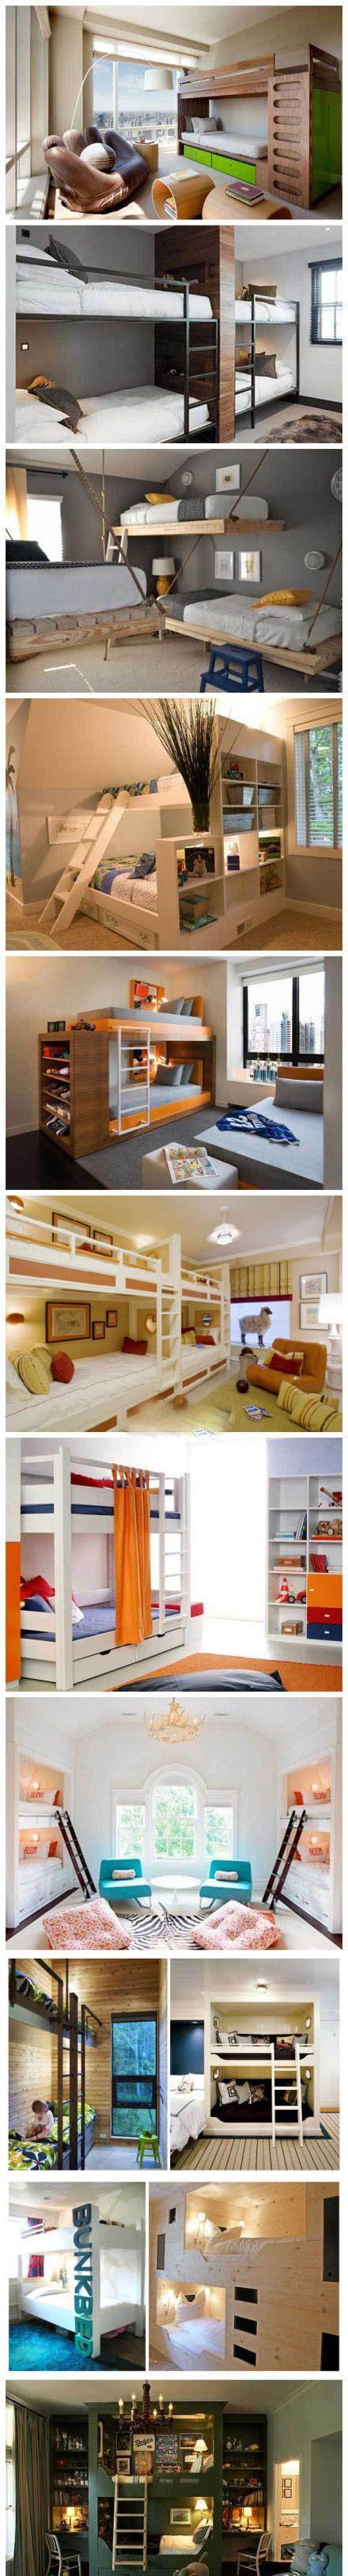 dorm room ideas. dream on.